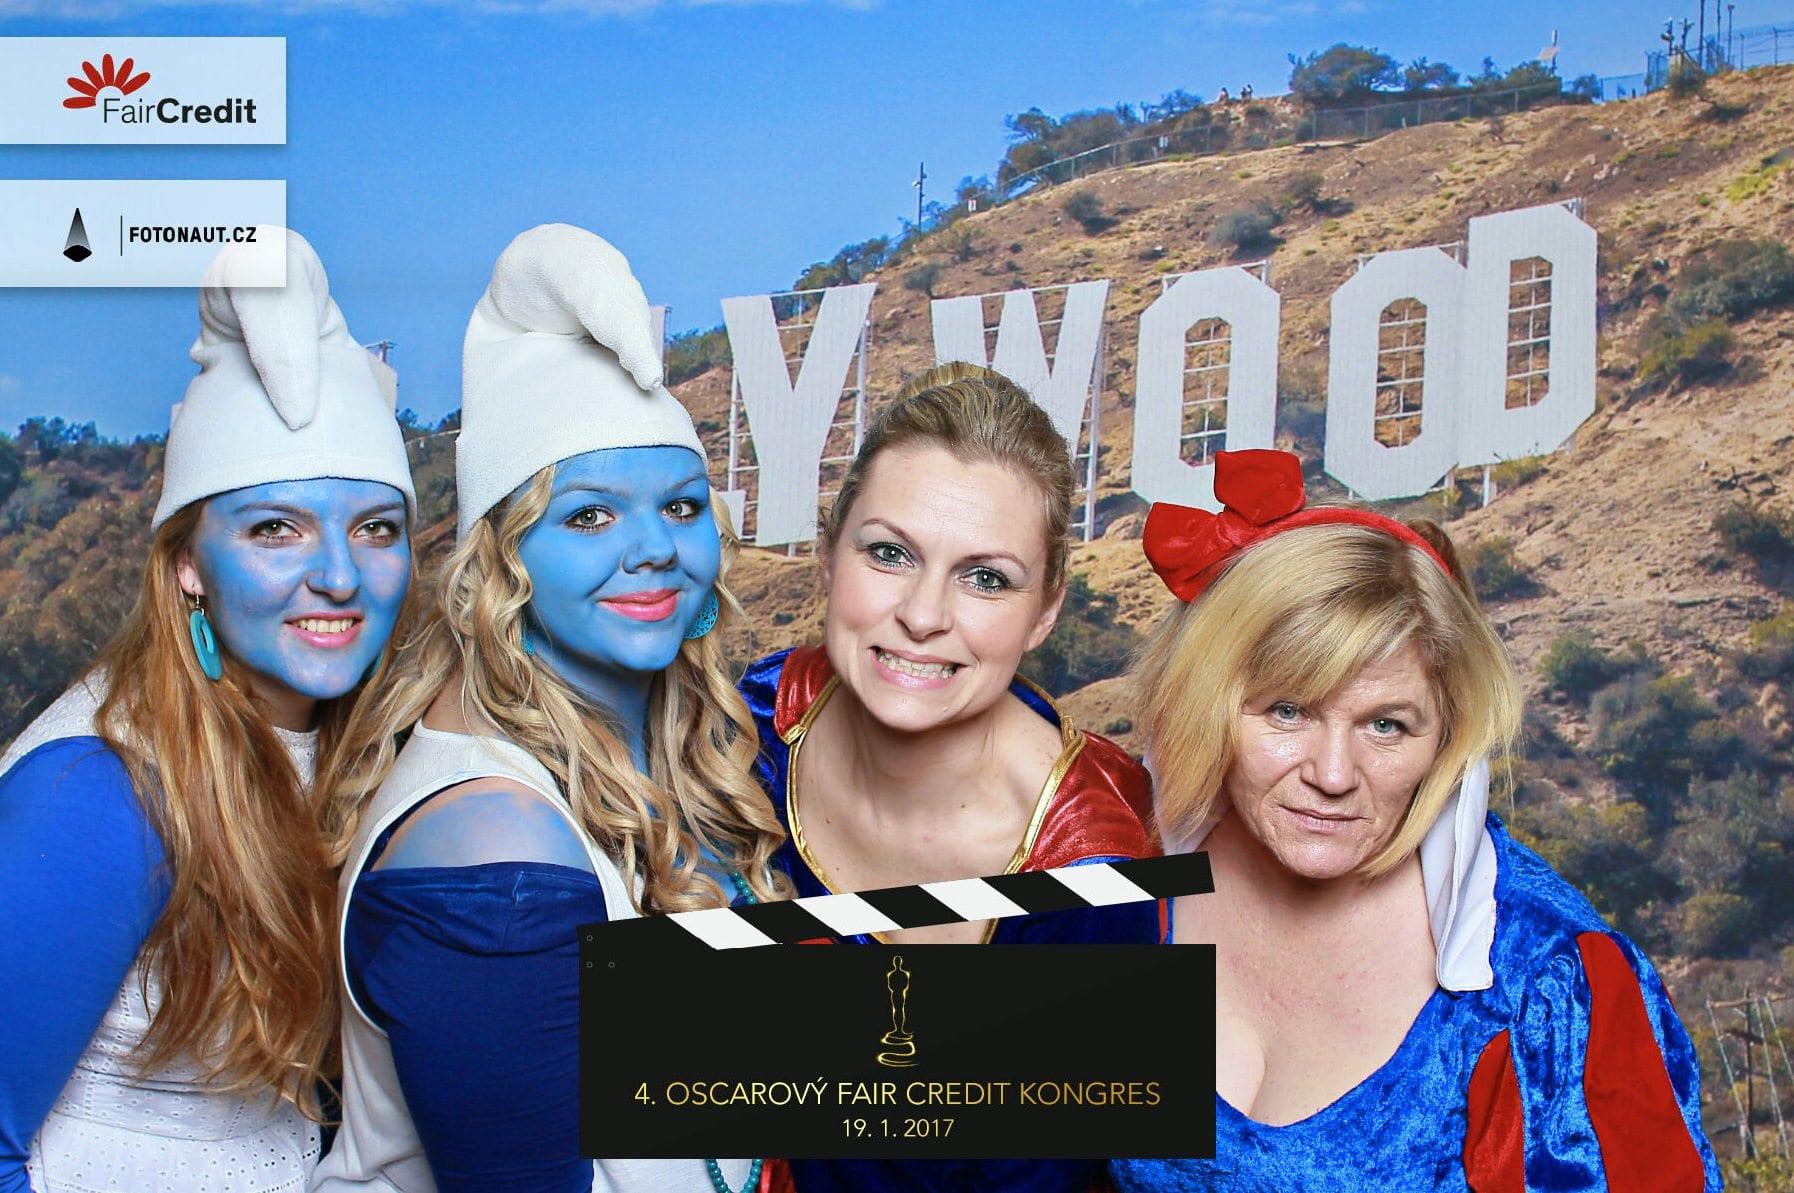 fotokoutek-4-oscarovy-fair-credit-kongres-19-1-2017-205541